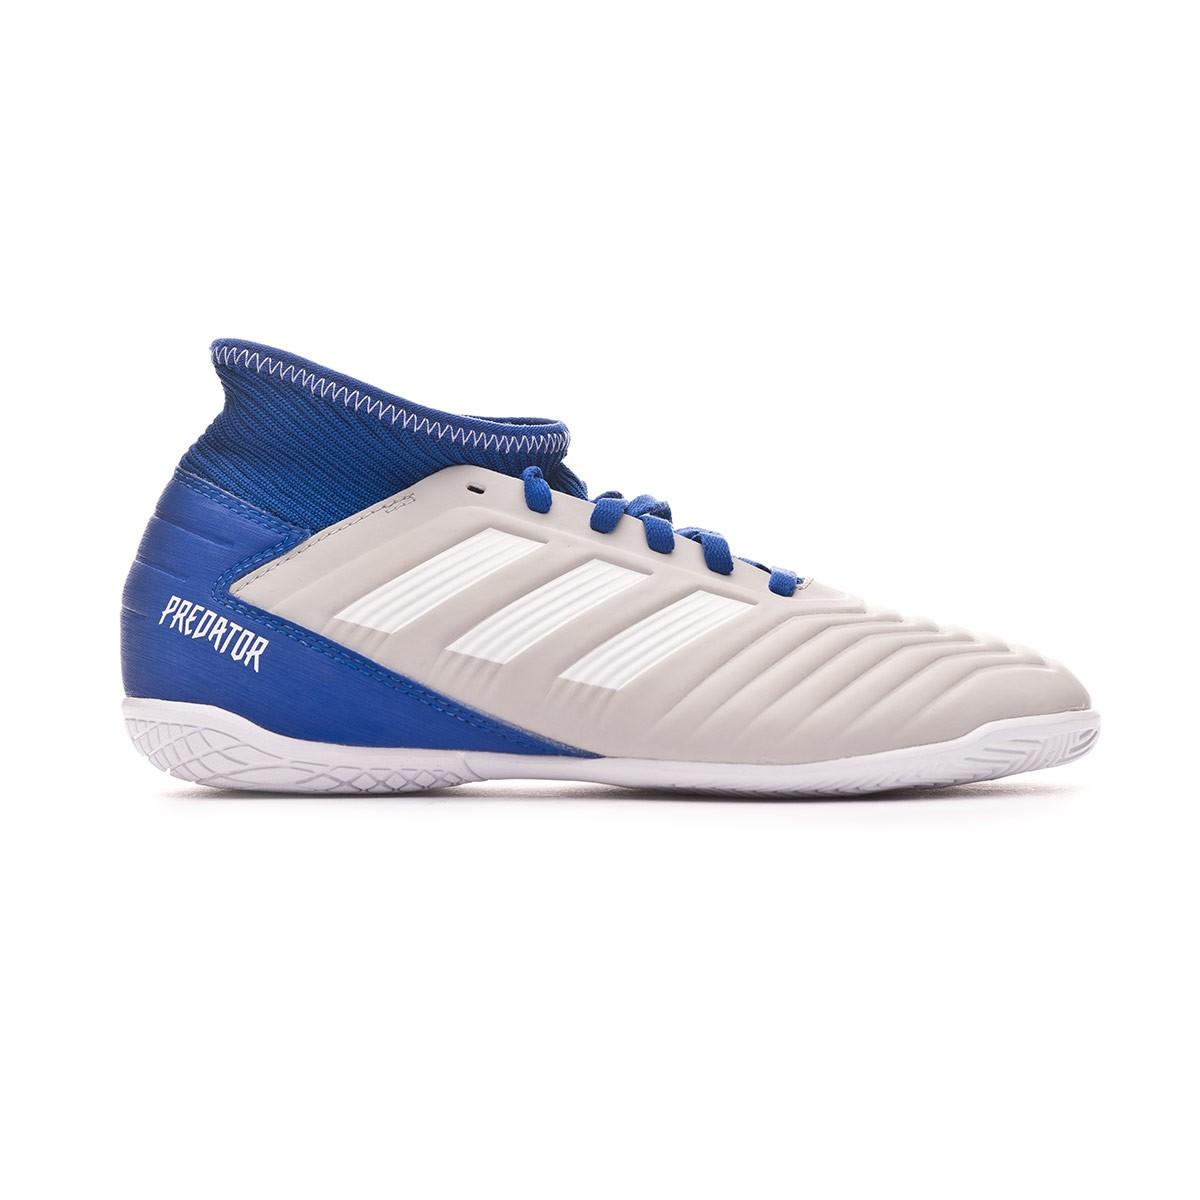 Zapatilla adidas Predator Tango 19.3 IN Niño